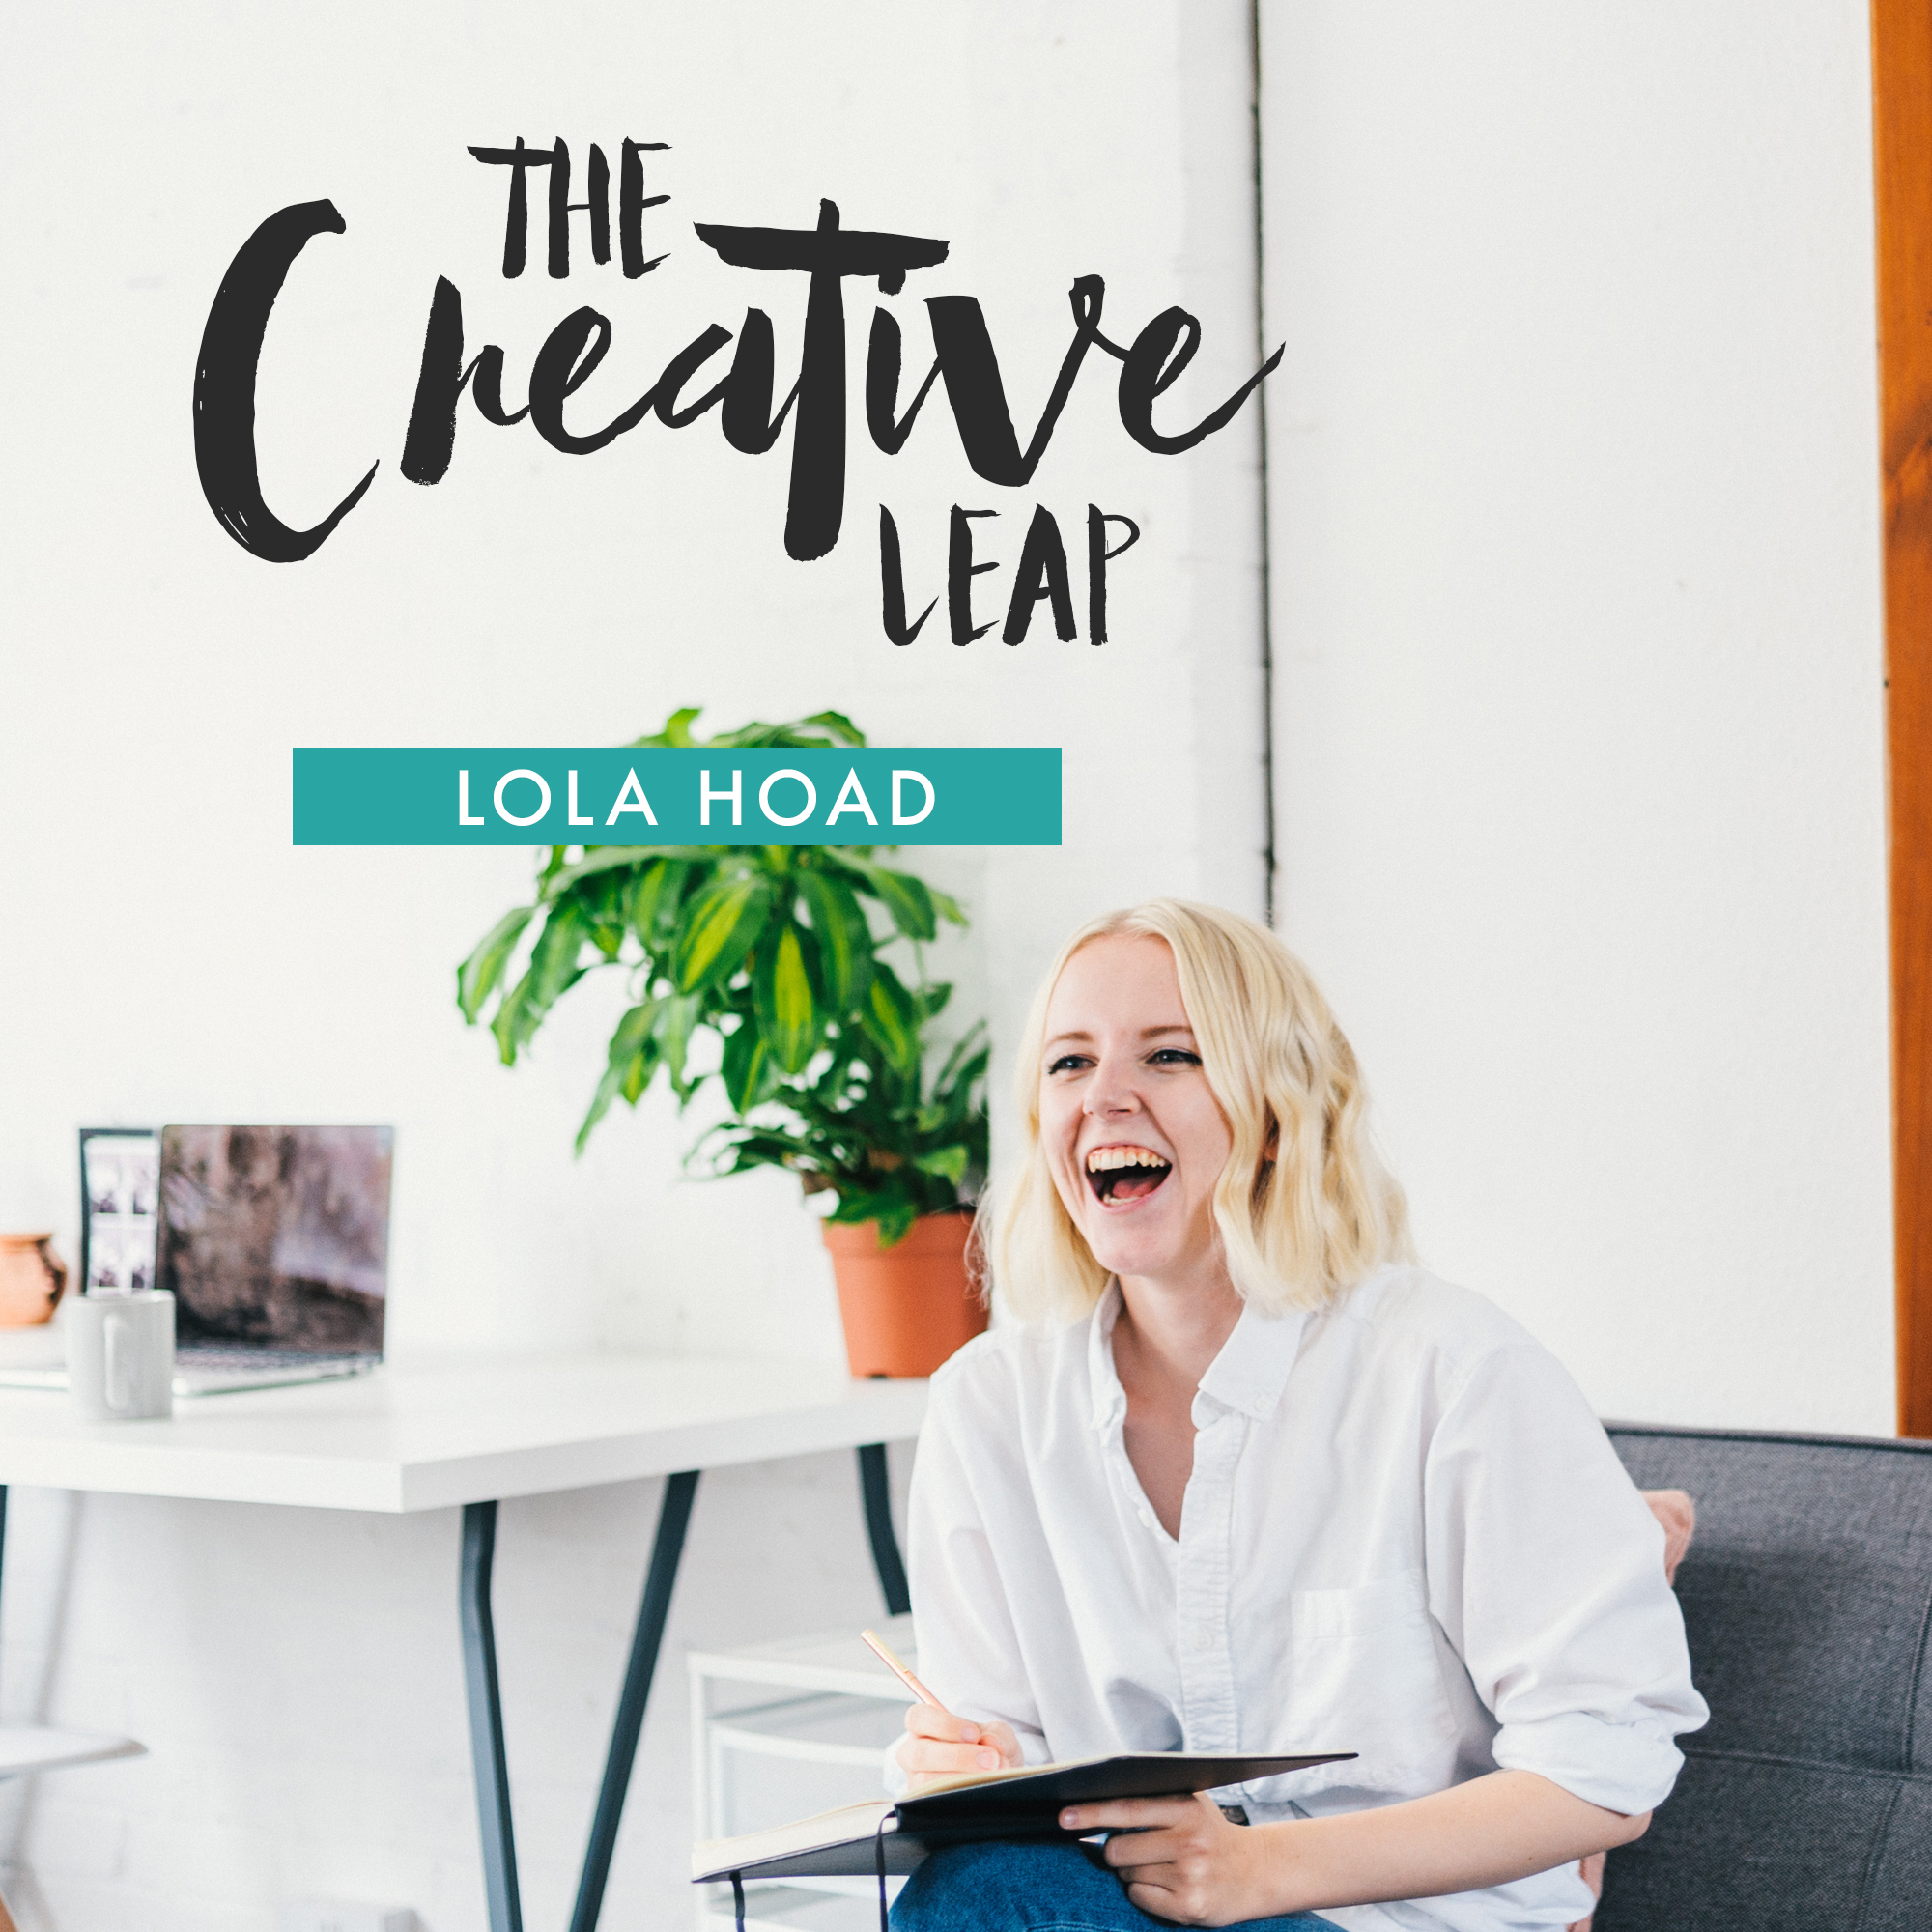 The-Creative-Leap-Lola-Hoad.jpg